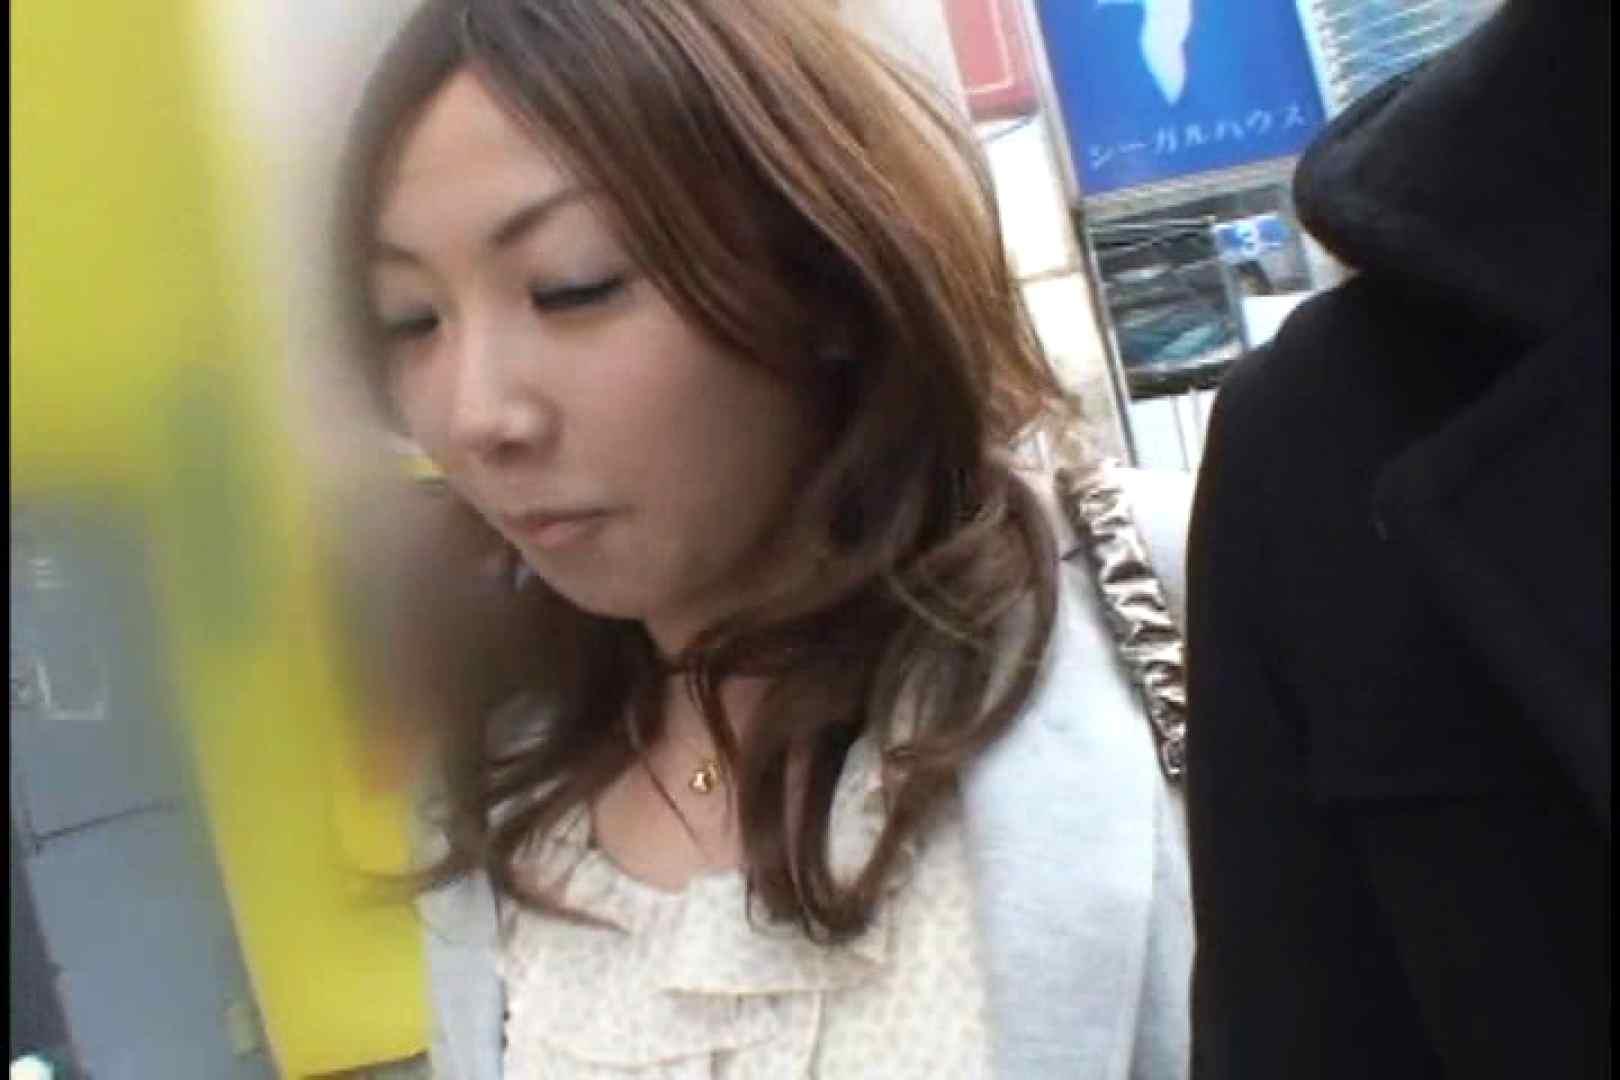 JDハンター全国ツアー vol.041 前編 女子大生ハメ撮り  48Pix 2